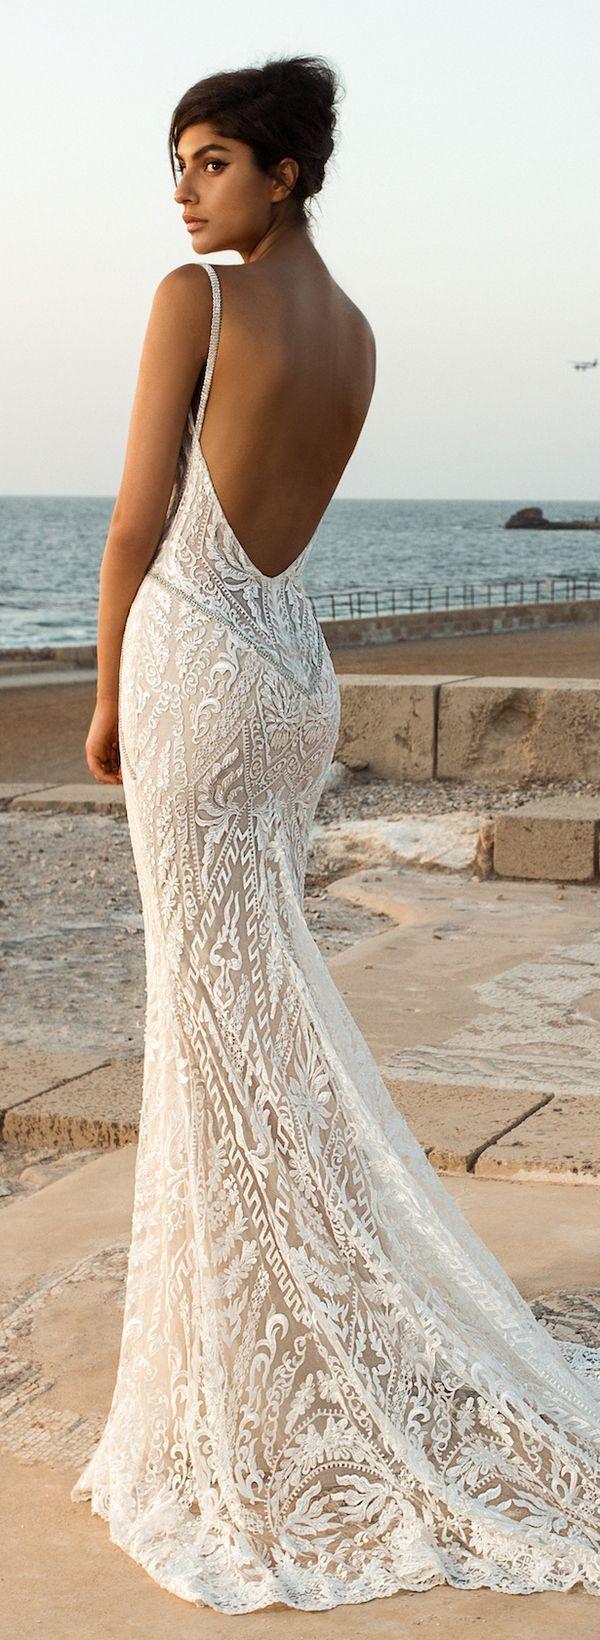 Galia Lahav Fall 2017 Wedding Dresses – Le Secret Royal II & Gala ...